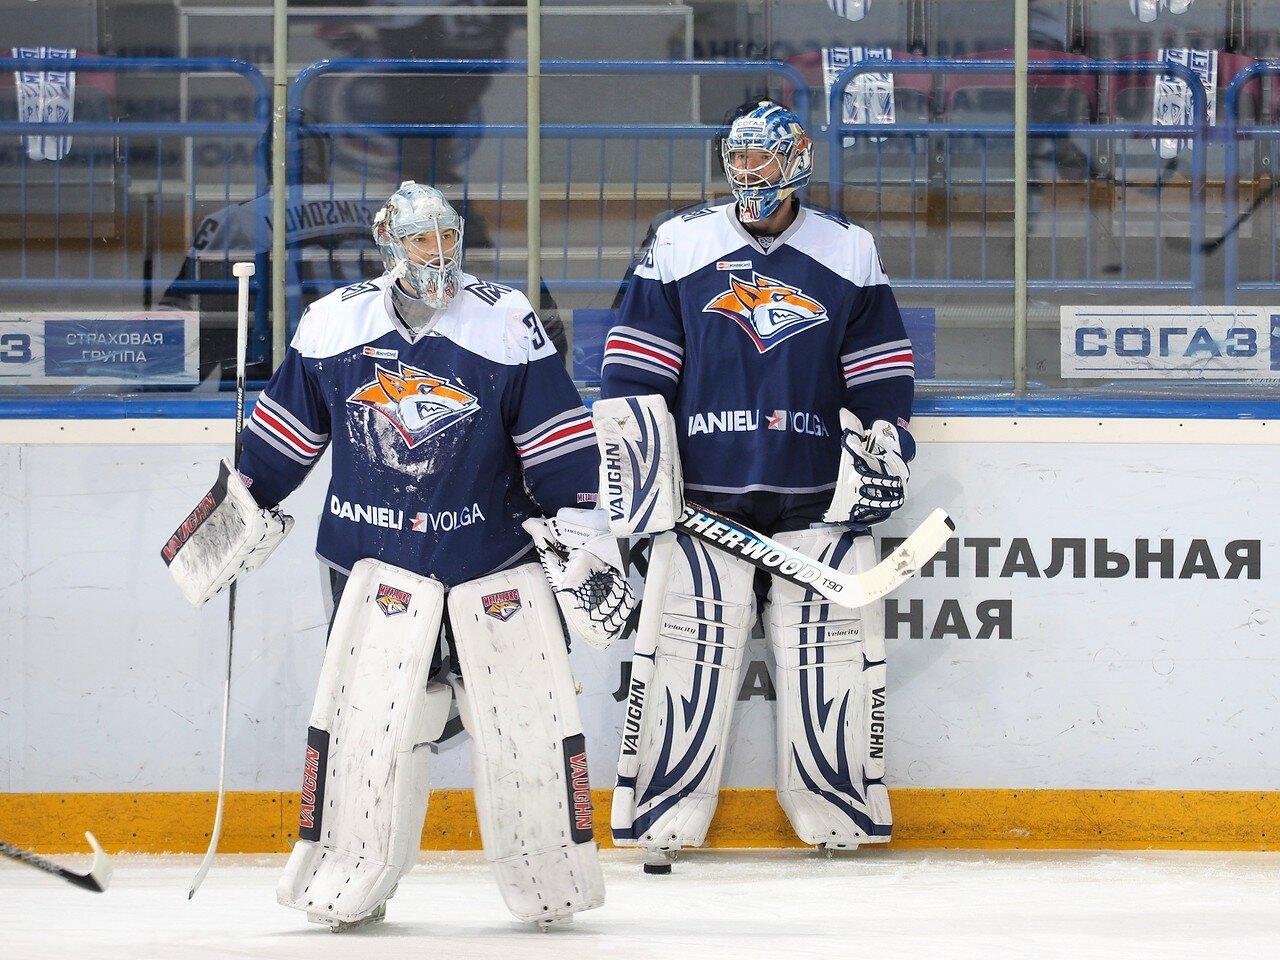 41Плей-офф 2016 Восток Финал Металлург - Салават Юлаев 23.03.2016